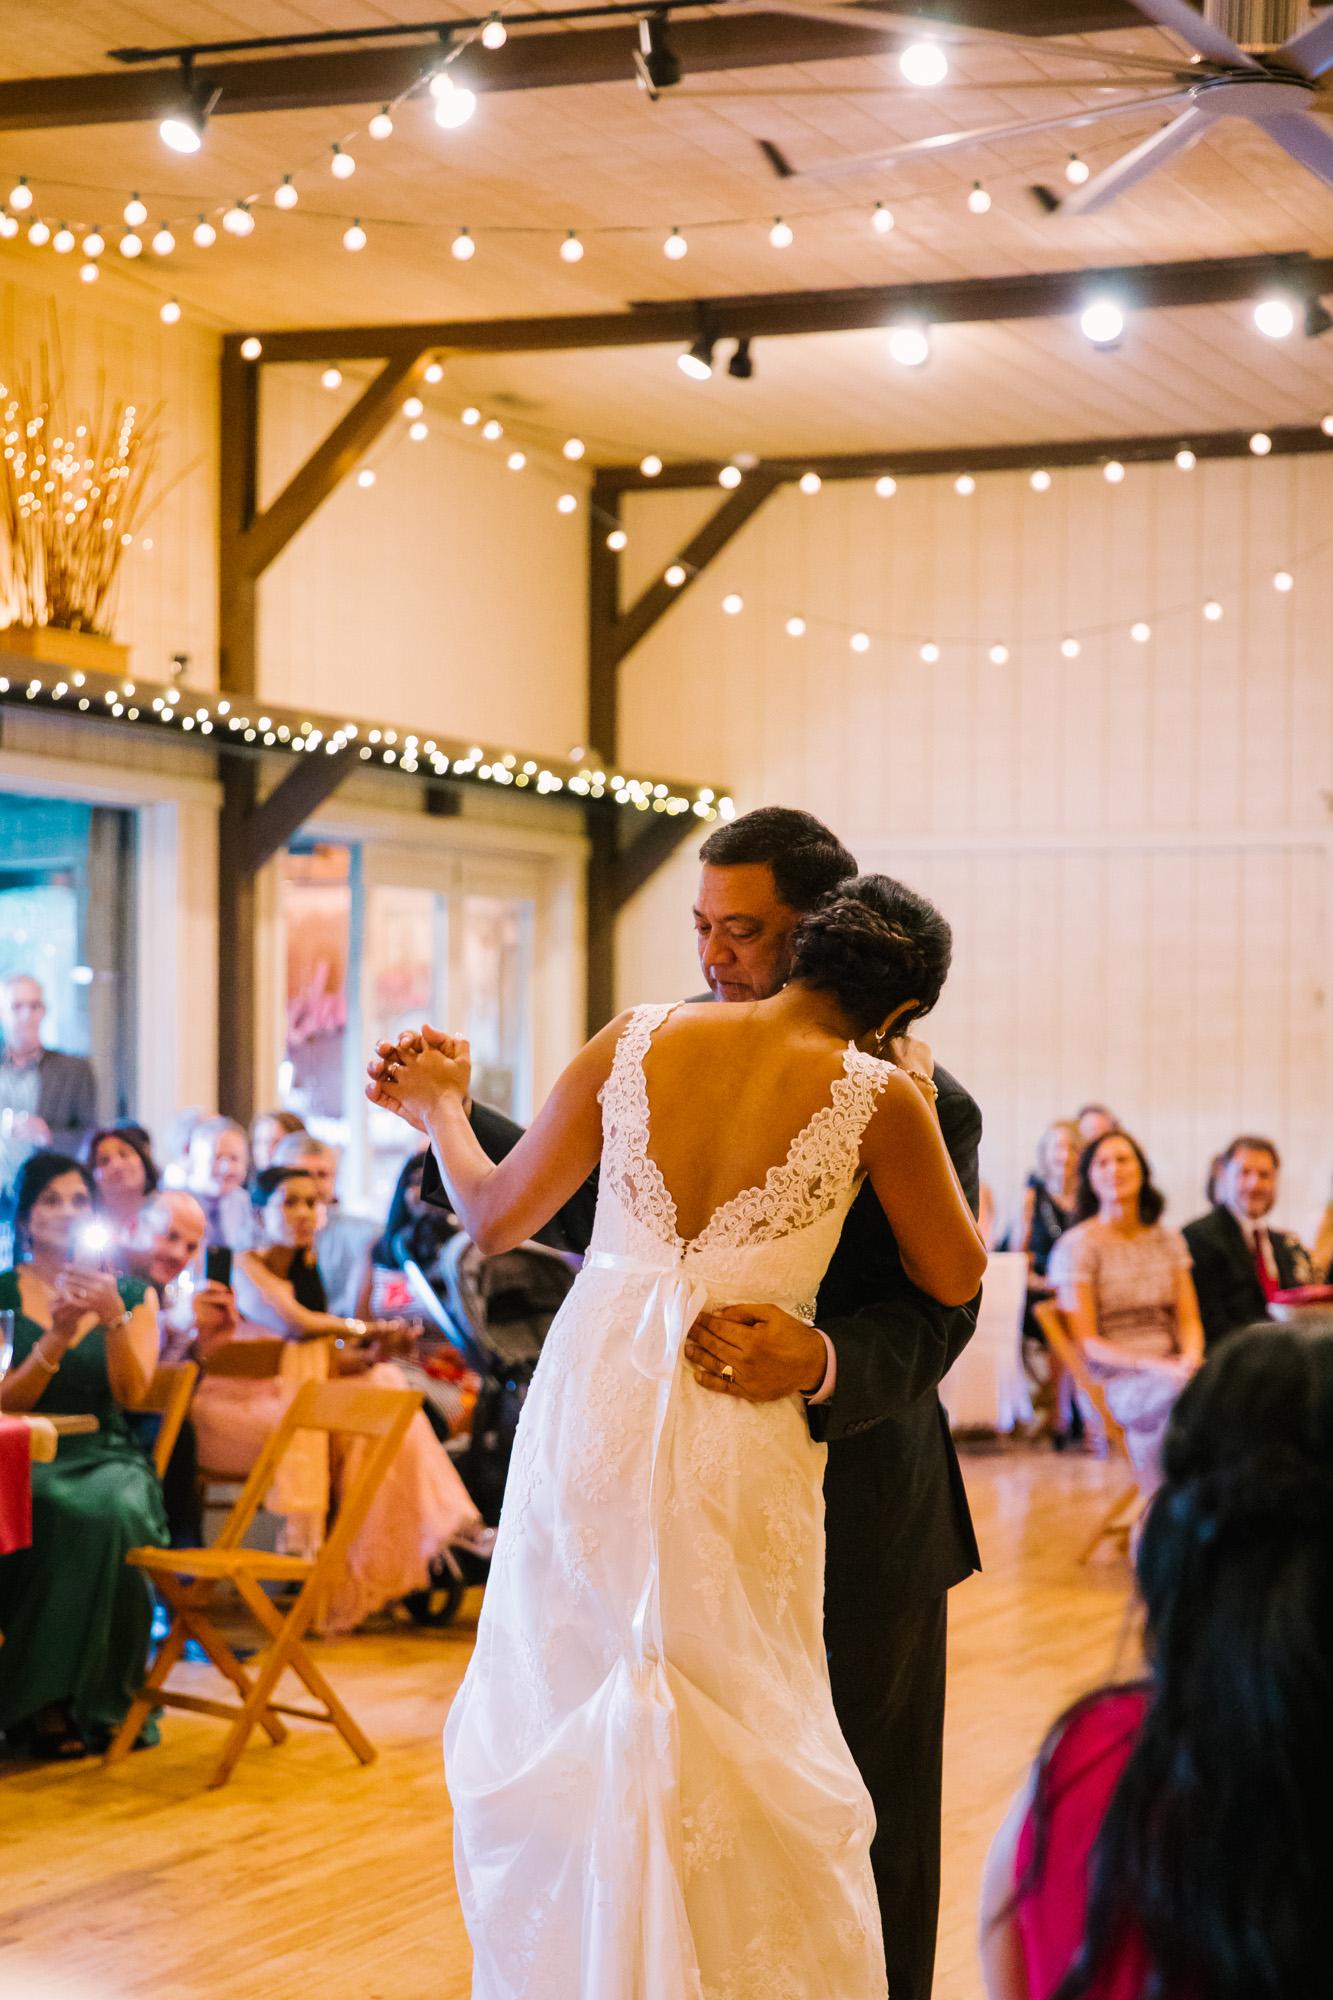 Waynesville NC Wedding Photography | Wedding Reception Father Daughter Dance